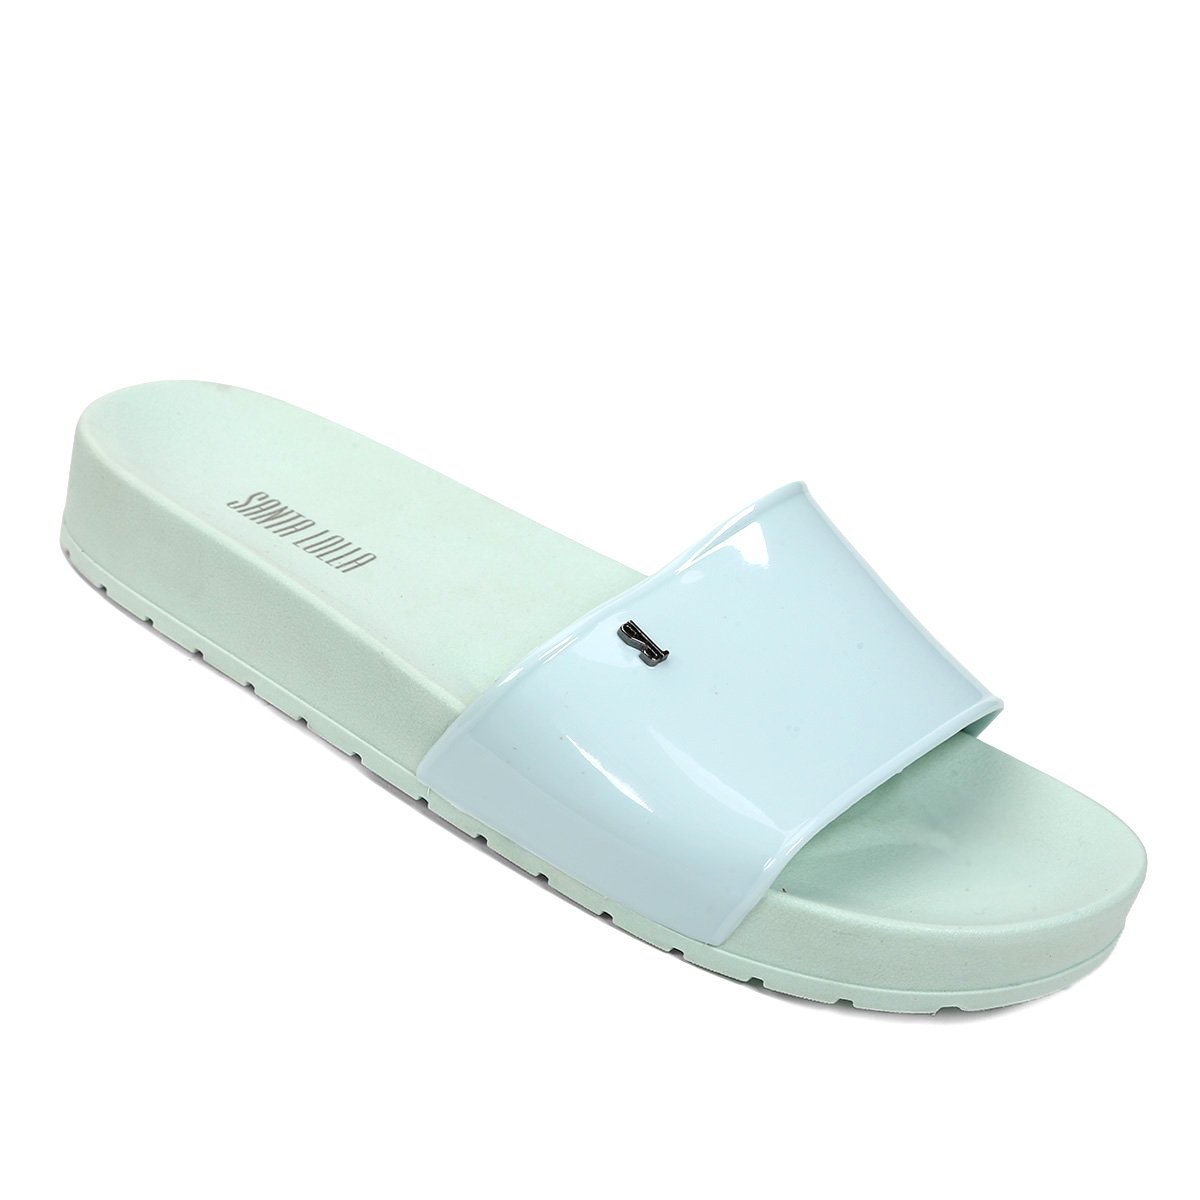 Santa Flip Santa Lolla Feminino Verde Verde Slide Chinelo Chinelo Feminino Slide Flop Flip Flop Chinelo Santa Lolla WwyFFRAxHq